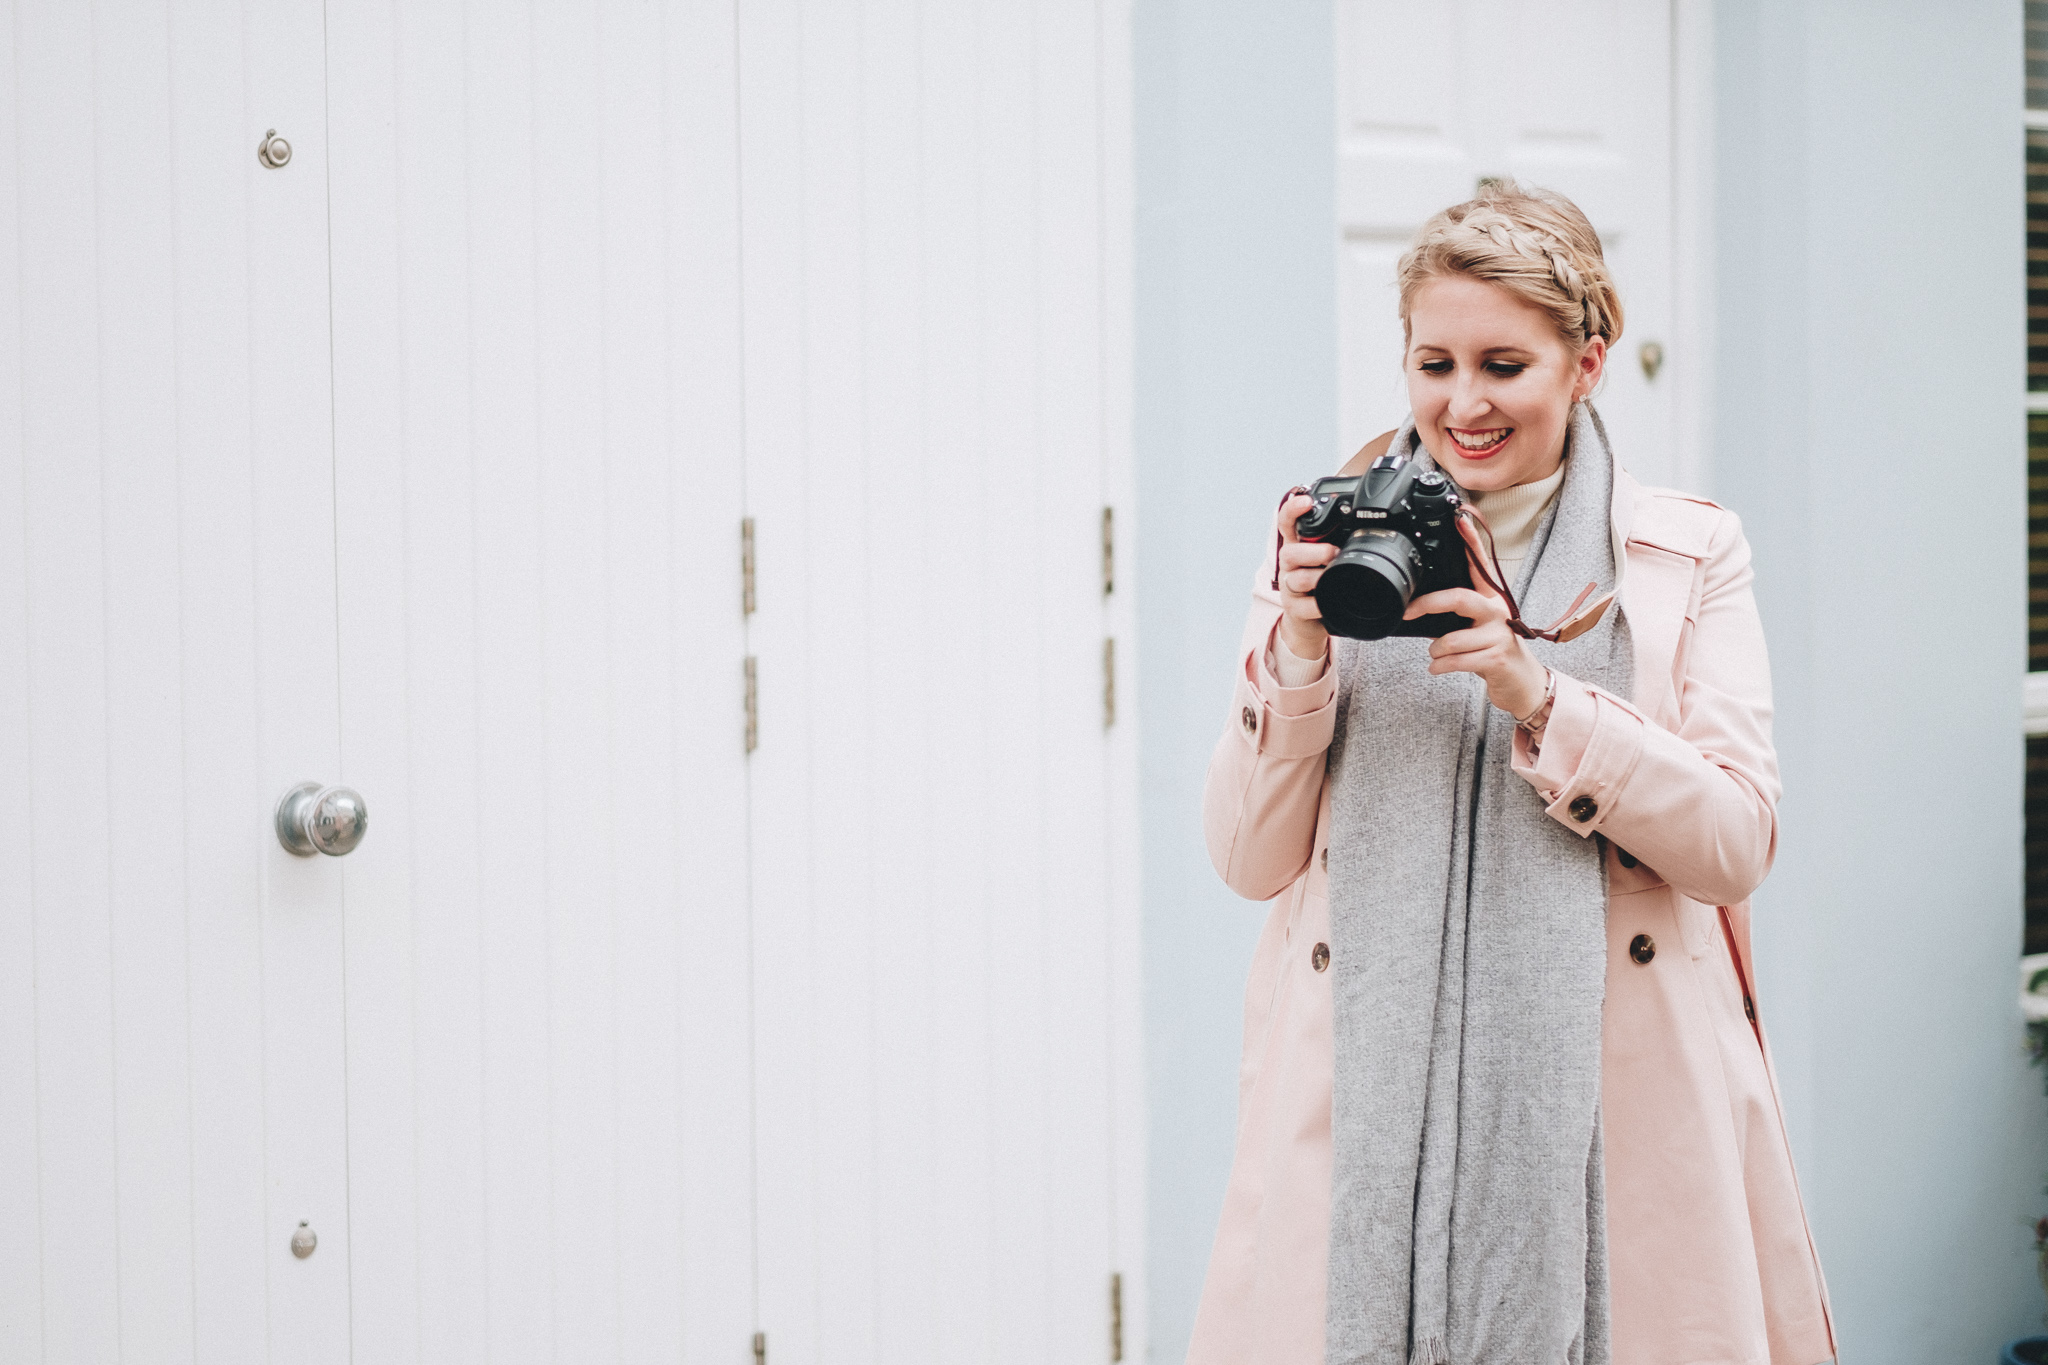 FXT18440 London Personal Brand Photographer Hayley Richardson | The London Mews | Personal Brand Photography